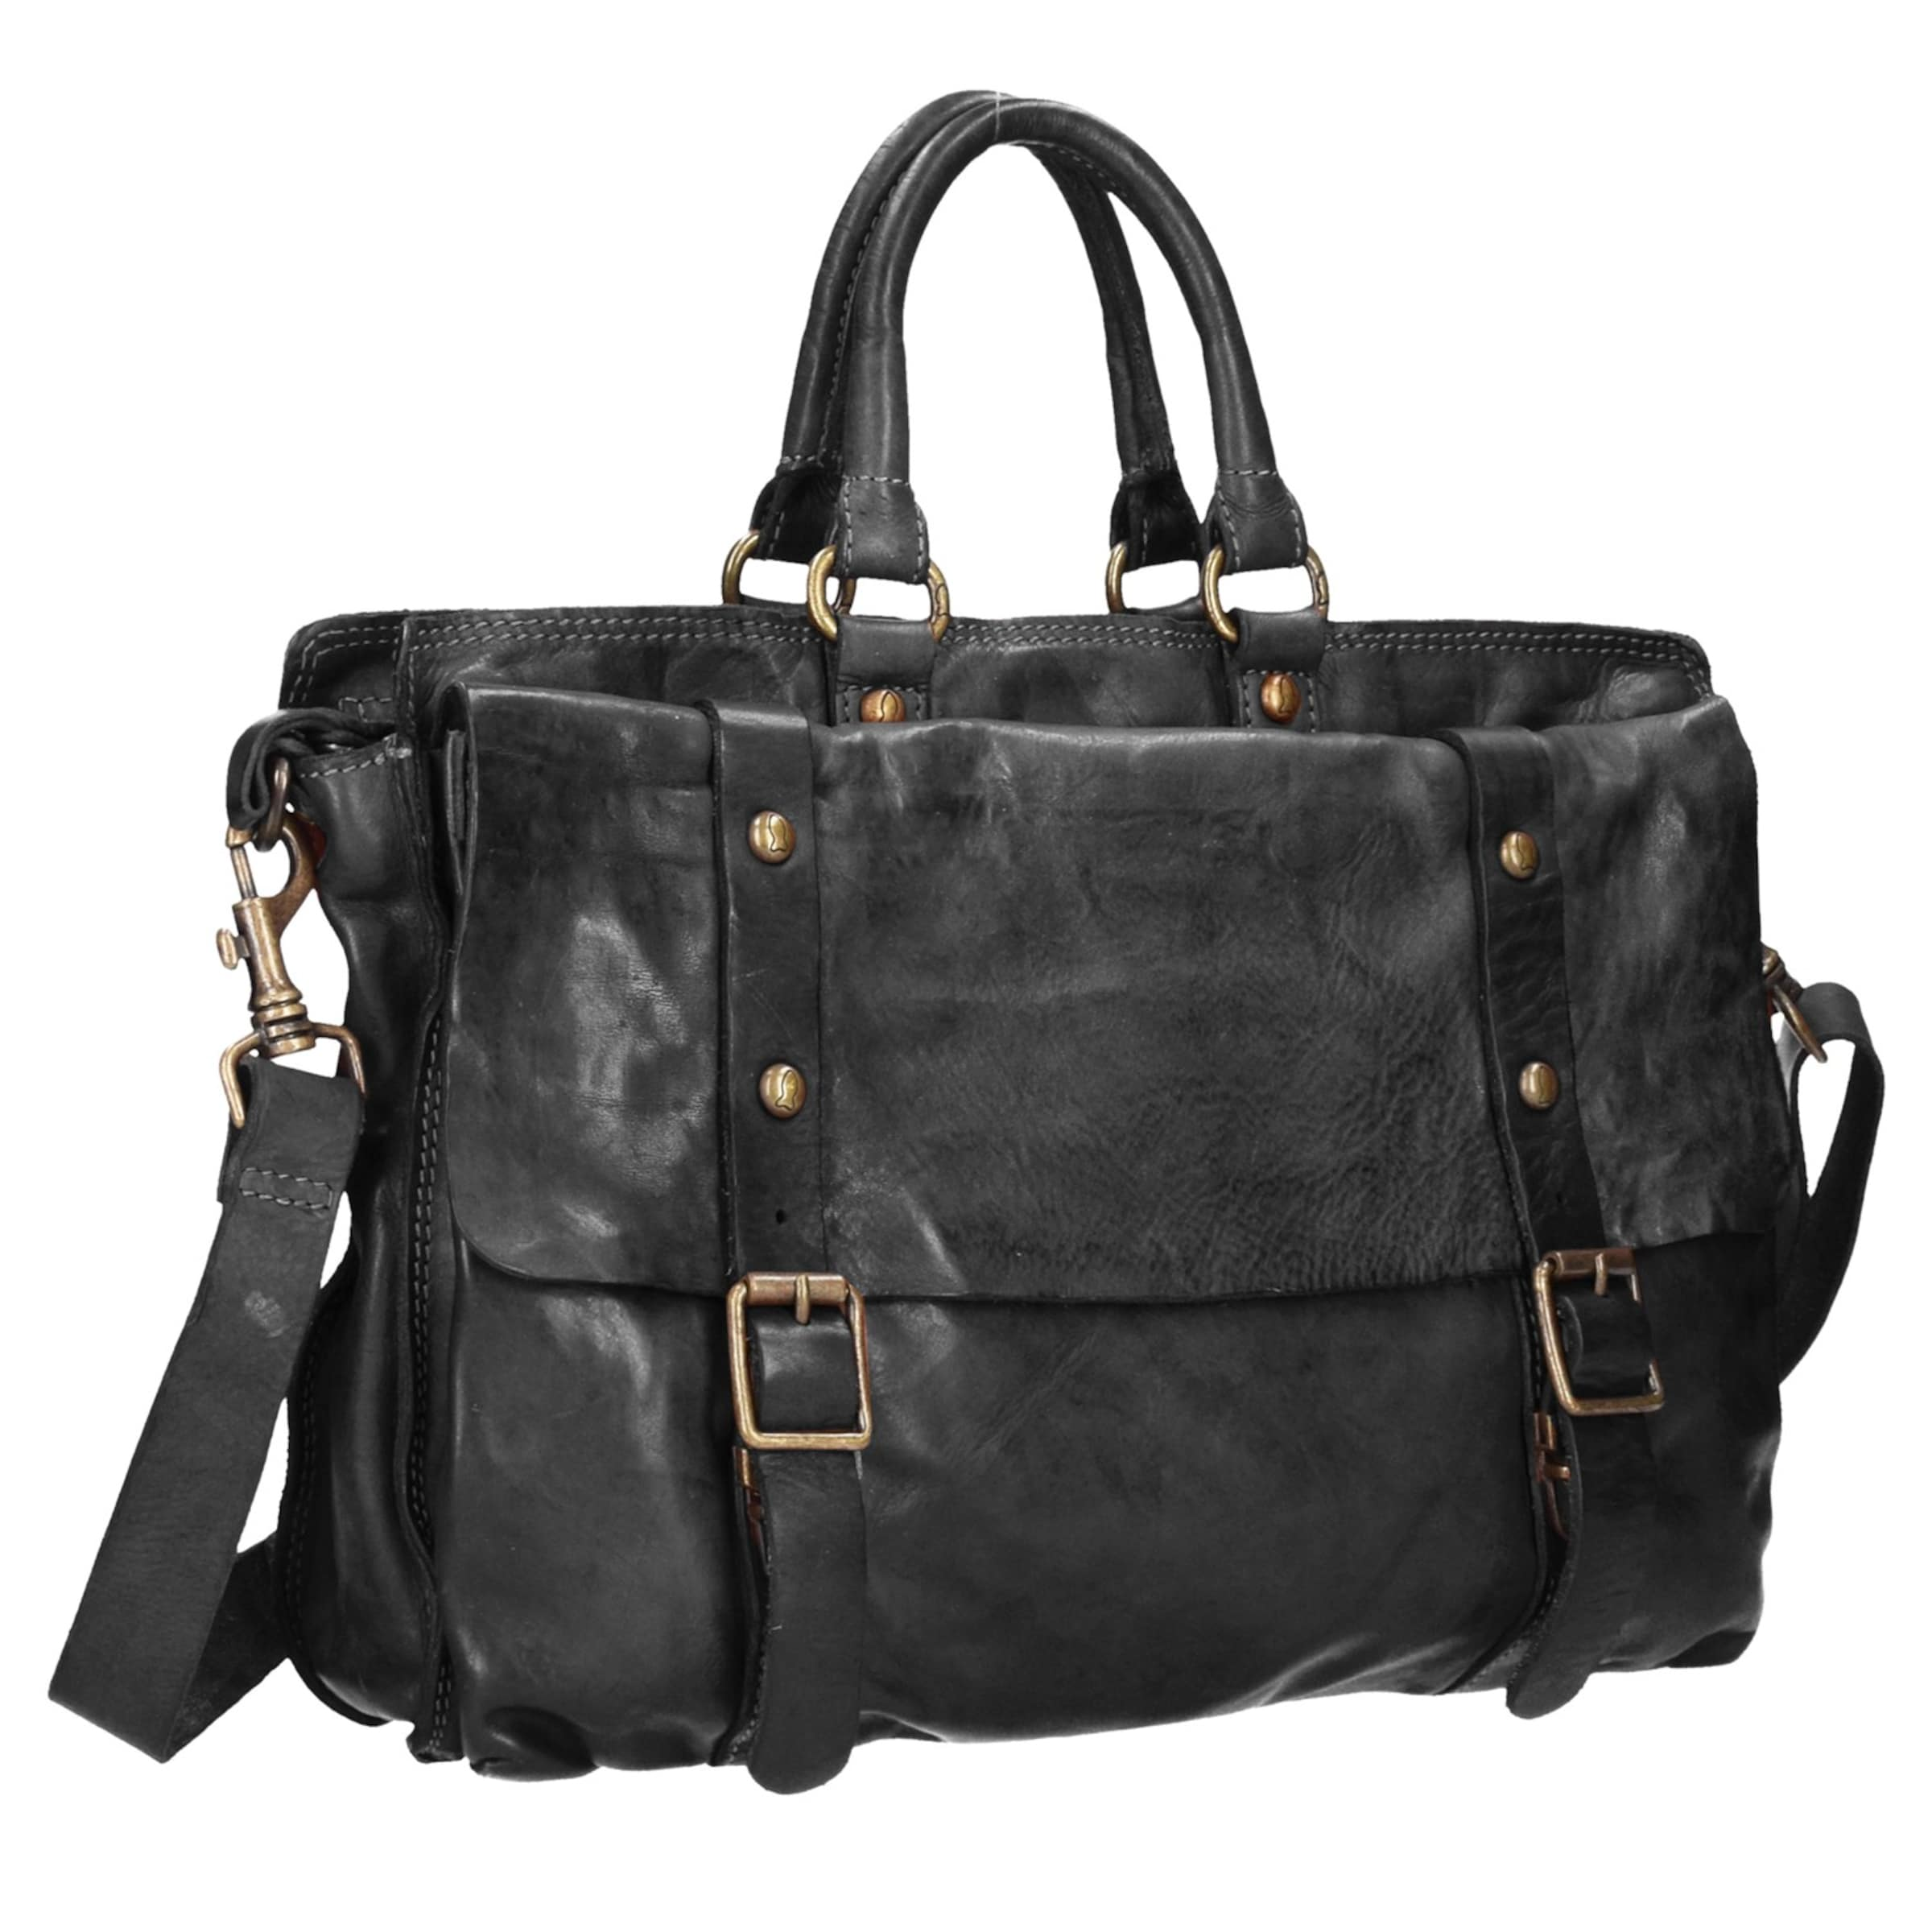 Bulk-Design Niedriger Preis Günstiger Preis Campomaggi Sequioa Handtasche 38 cm wyuw9I0Ib